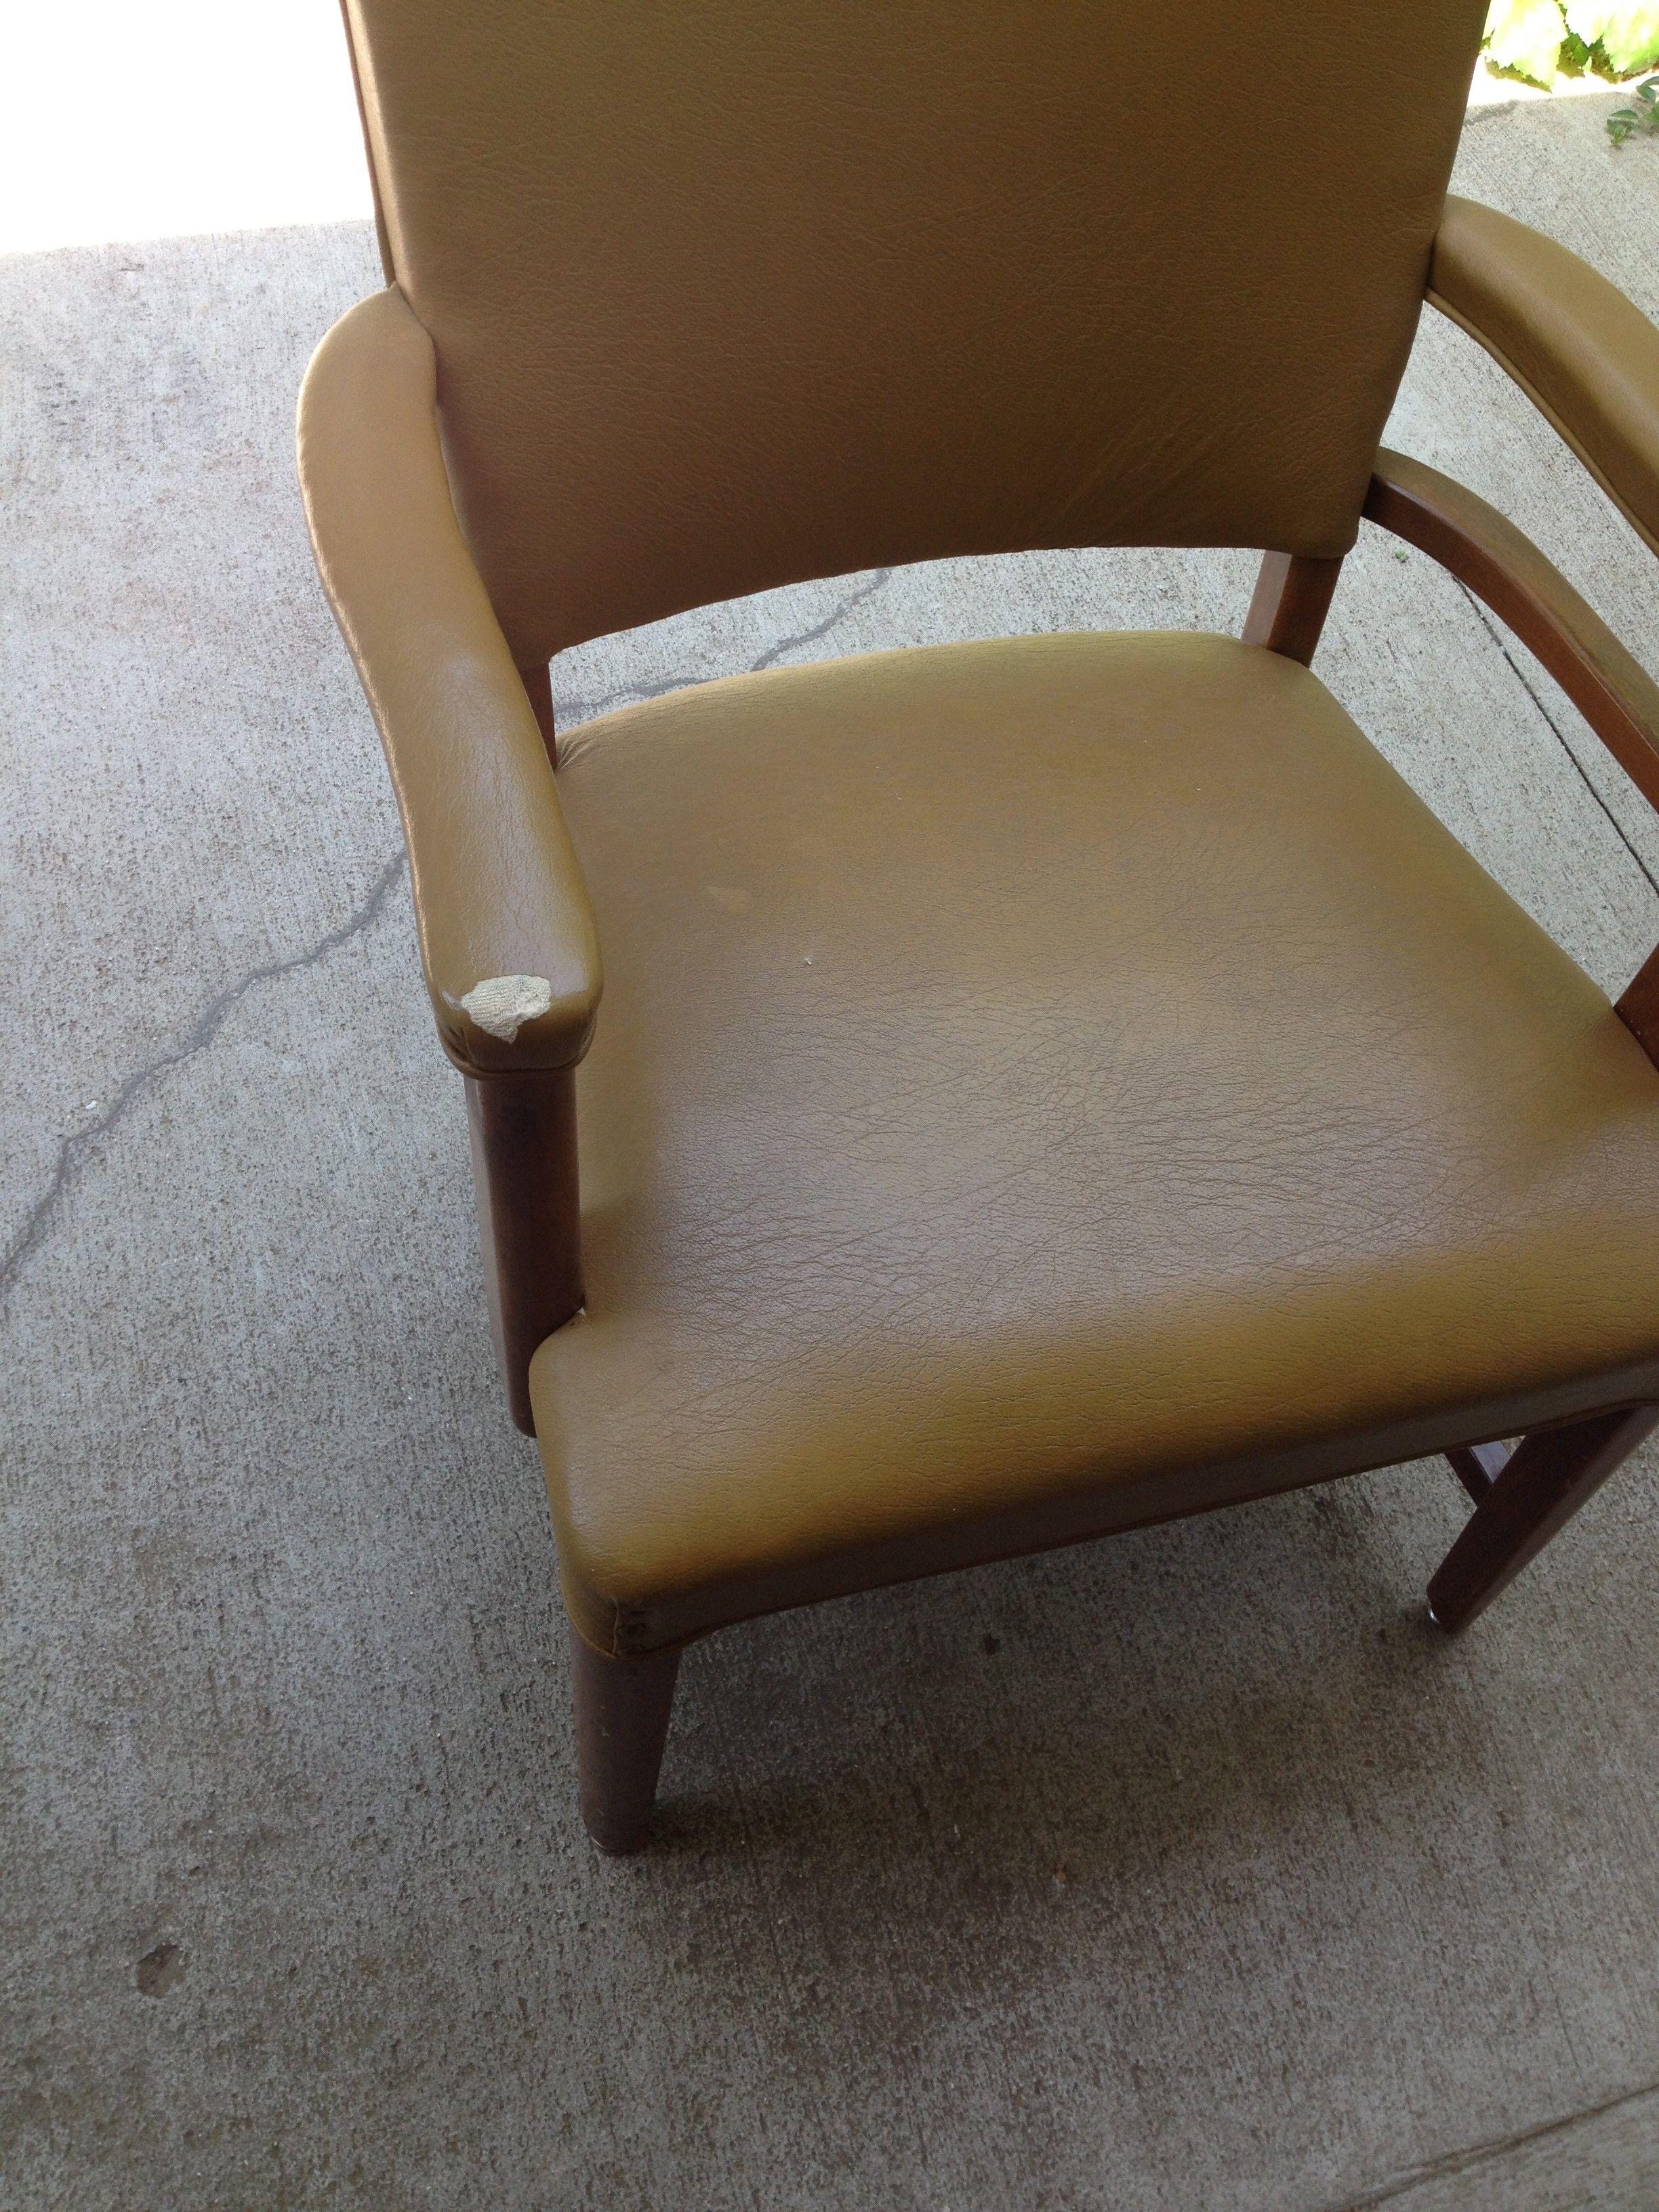 Vintage Jasper Company Chair $75   Indianapolis Http://furnishly.com/vintage